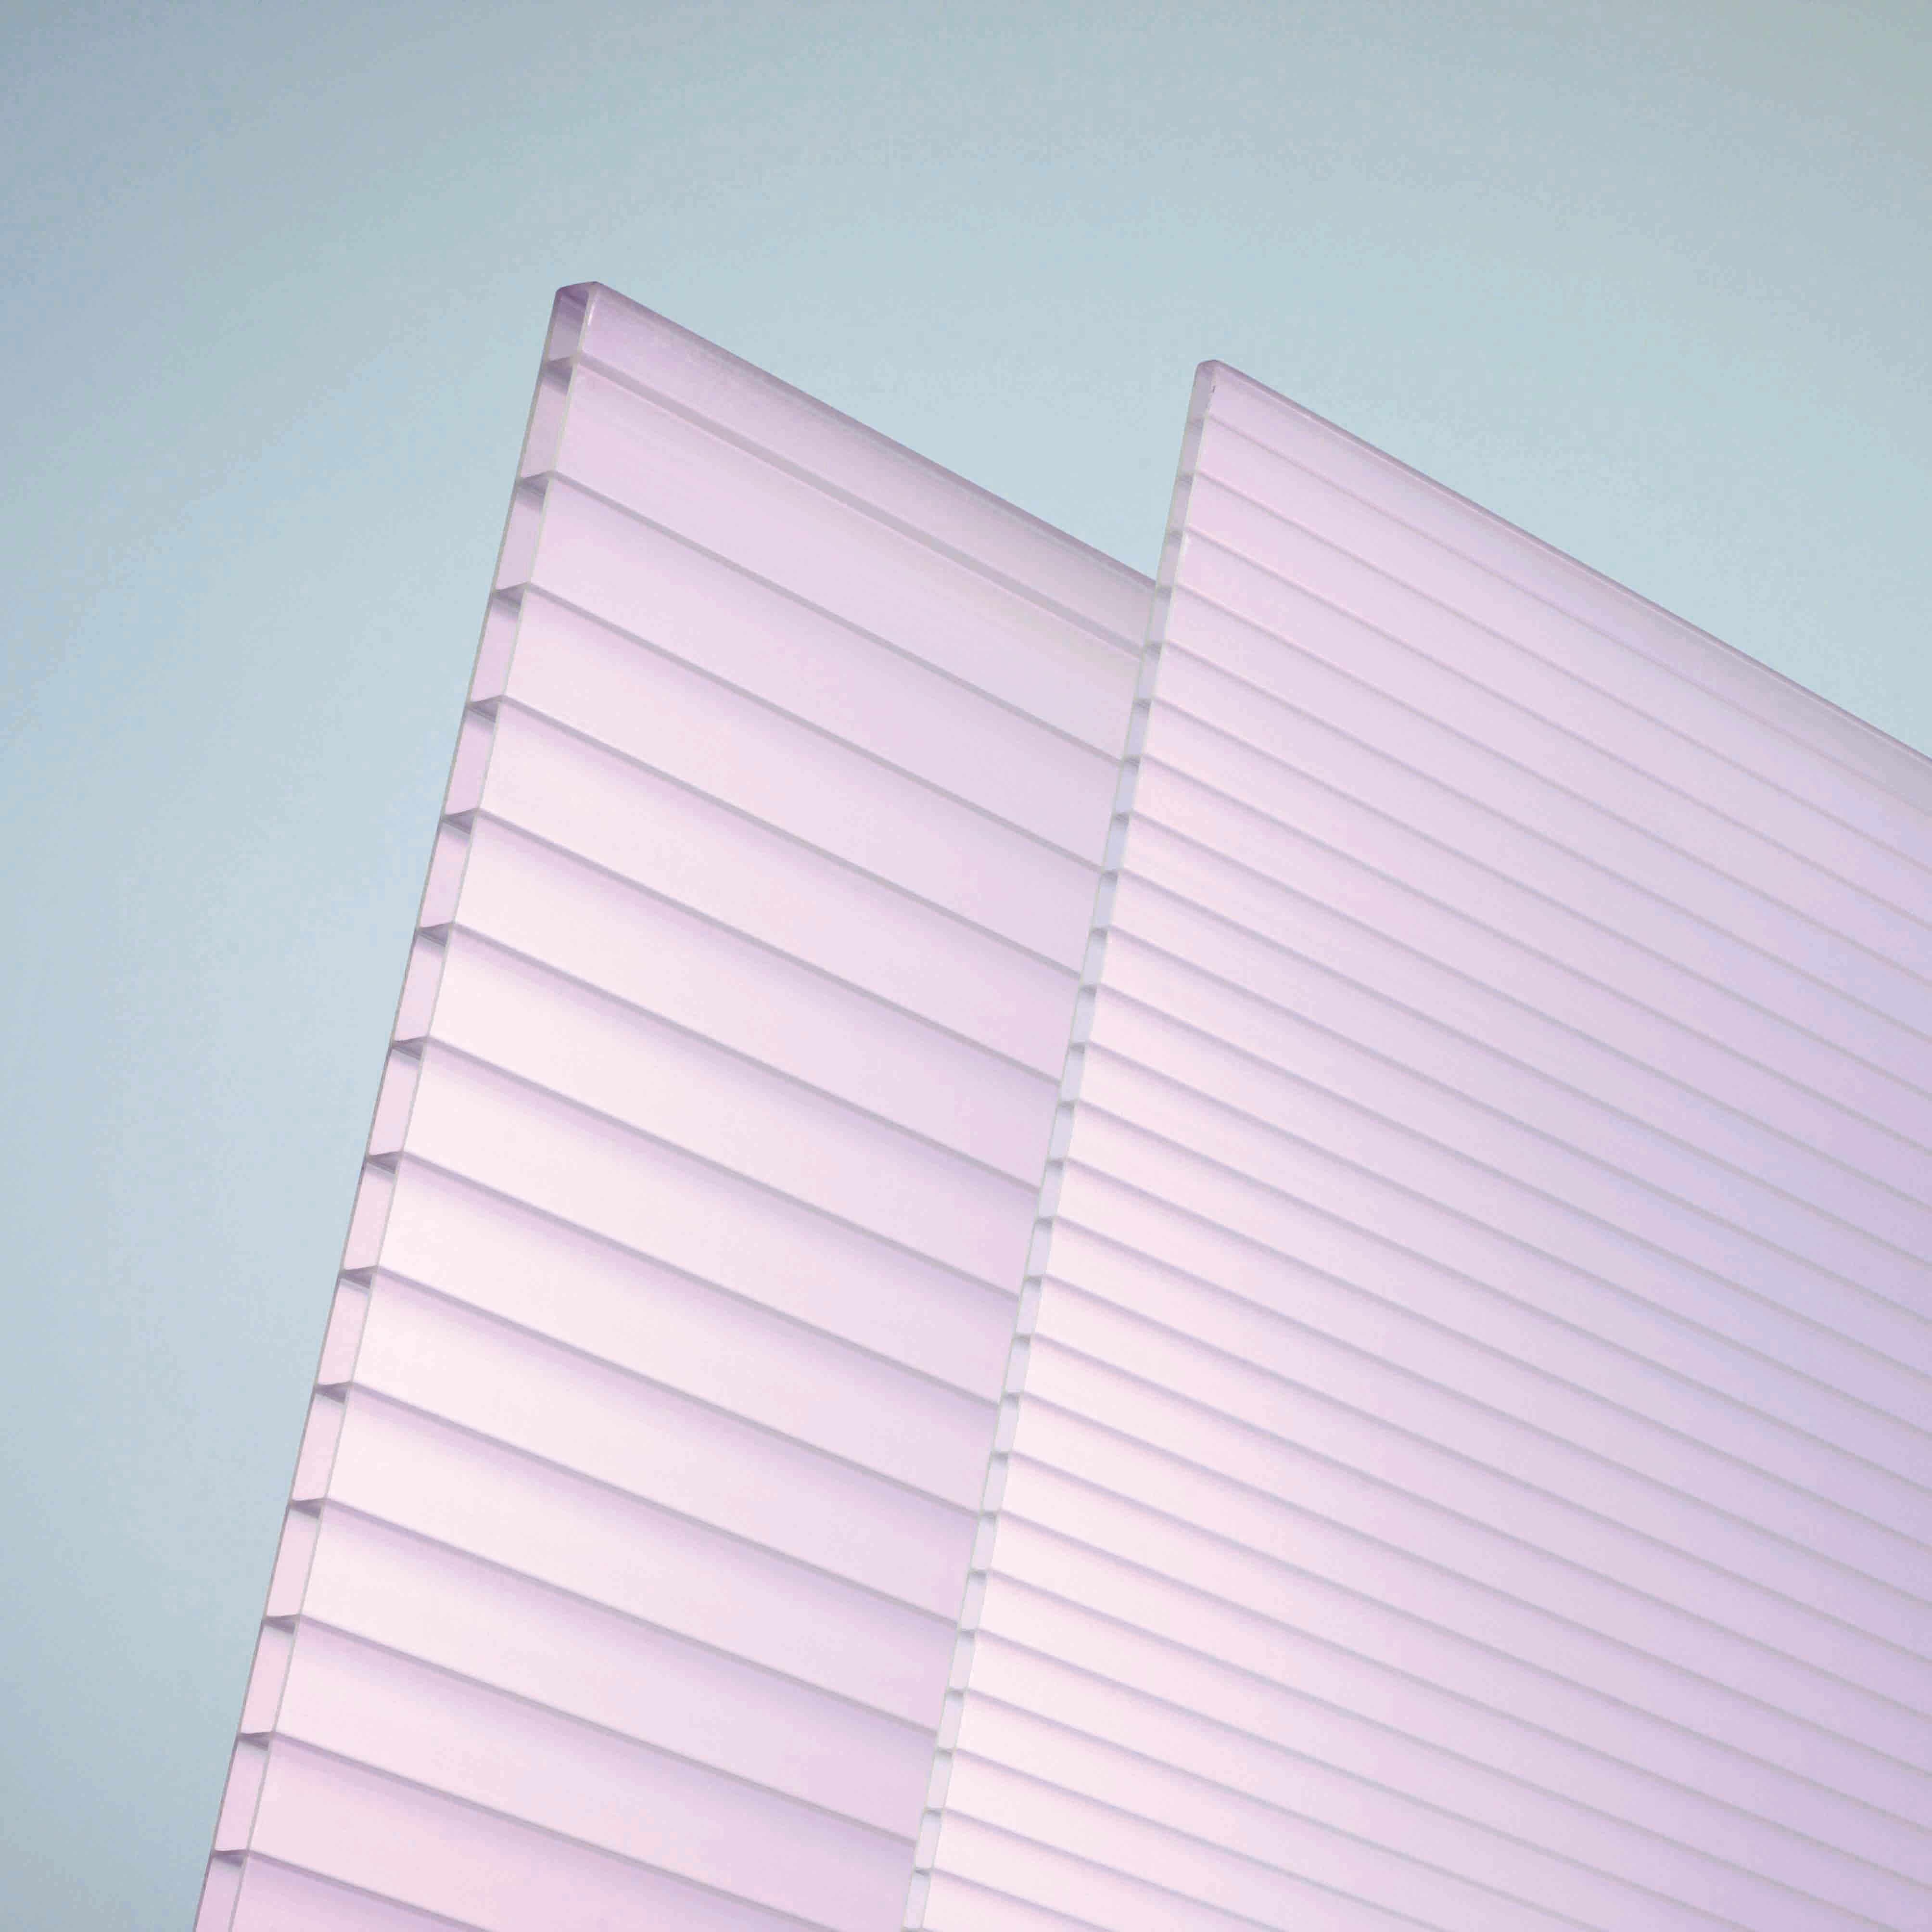 Acrylglas Stegplatte Produkte Von Konig Kunststoffe